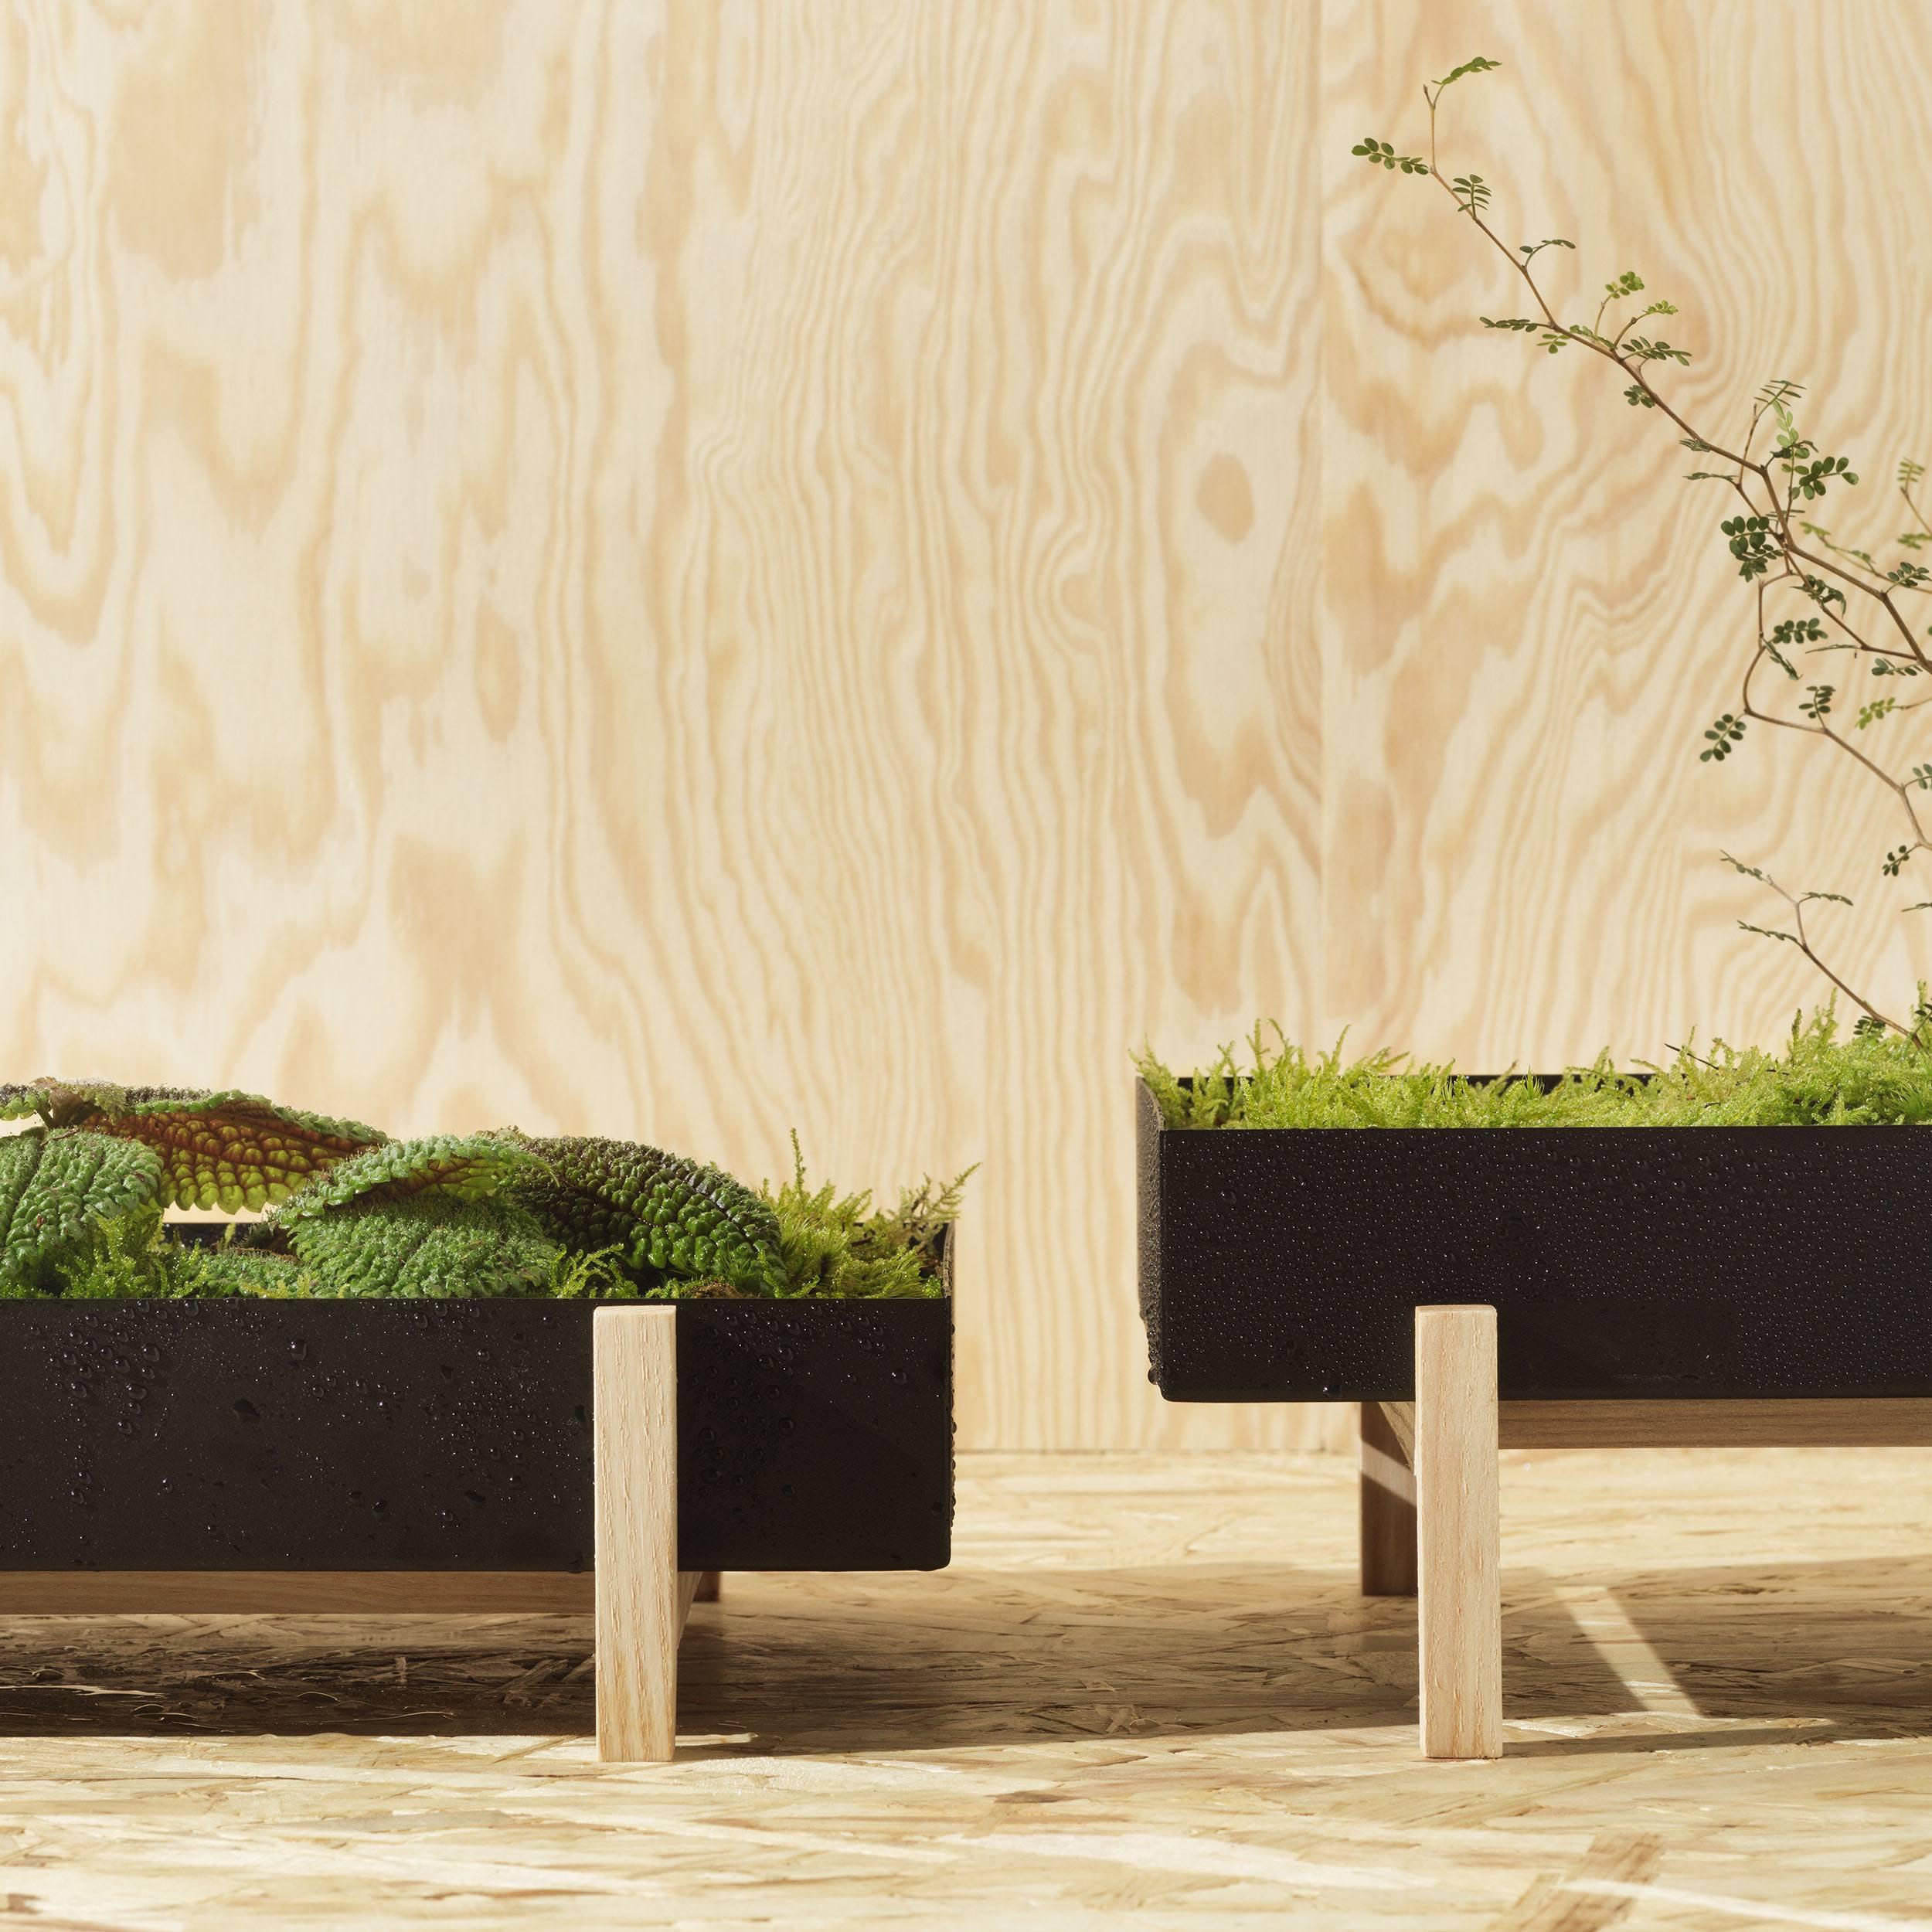 Botanic Tray Blumenkasten